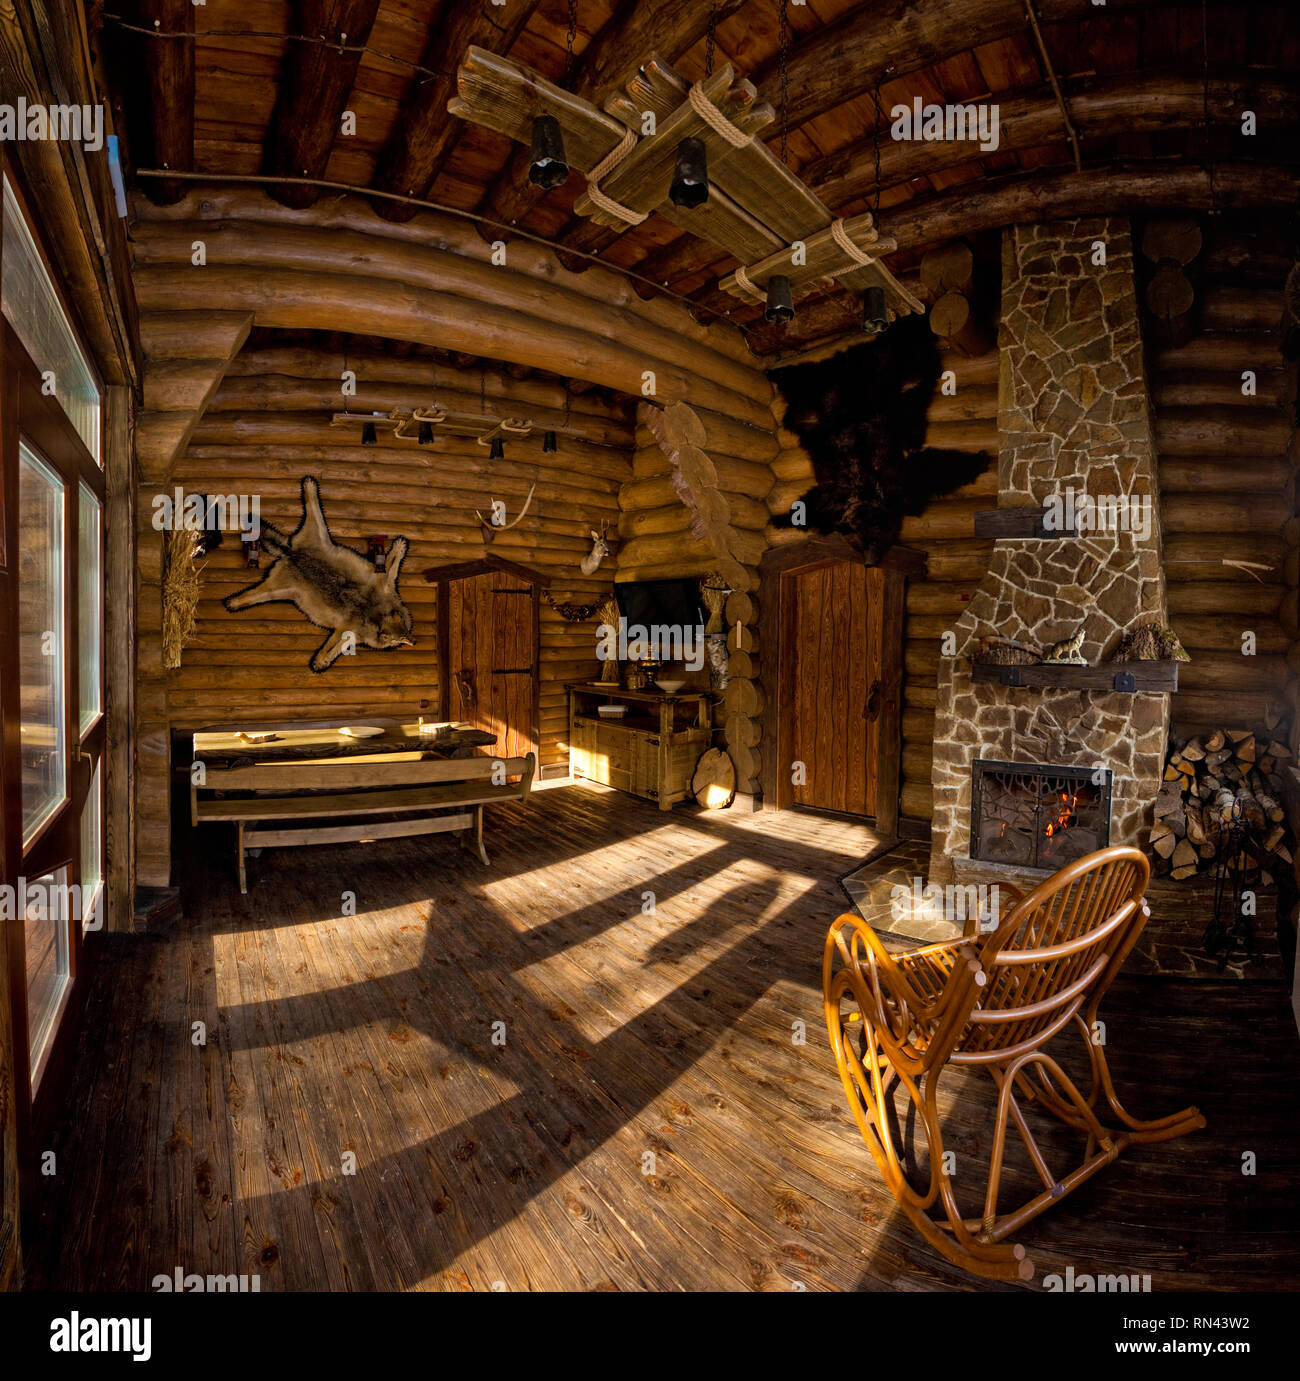 Land Interieur in Jäger Chalet mit Kamin Stockfoto, Bild ...